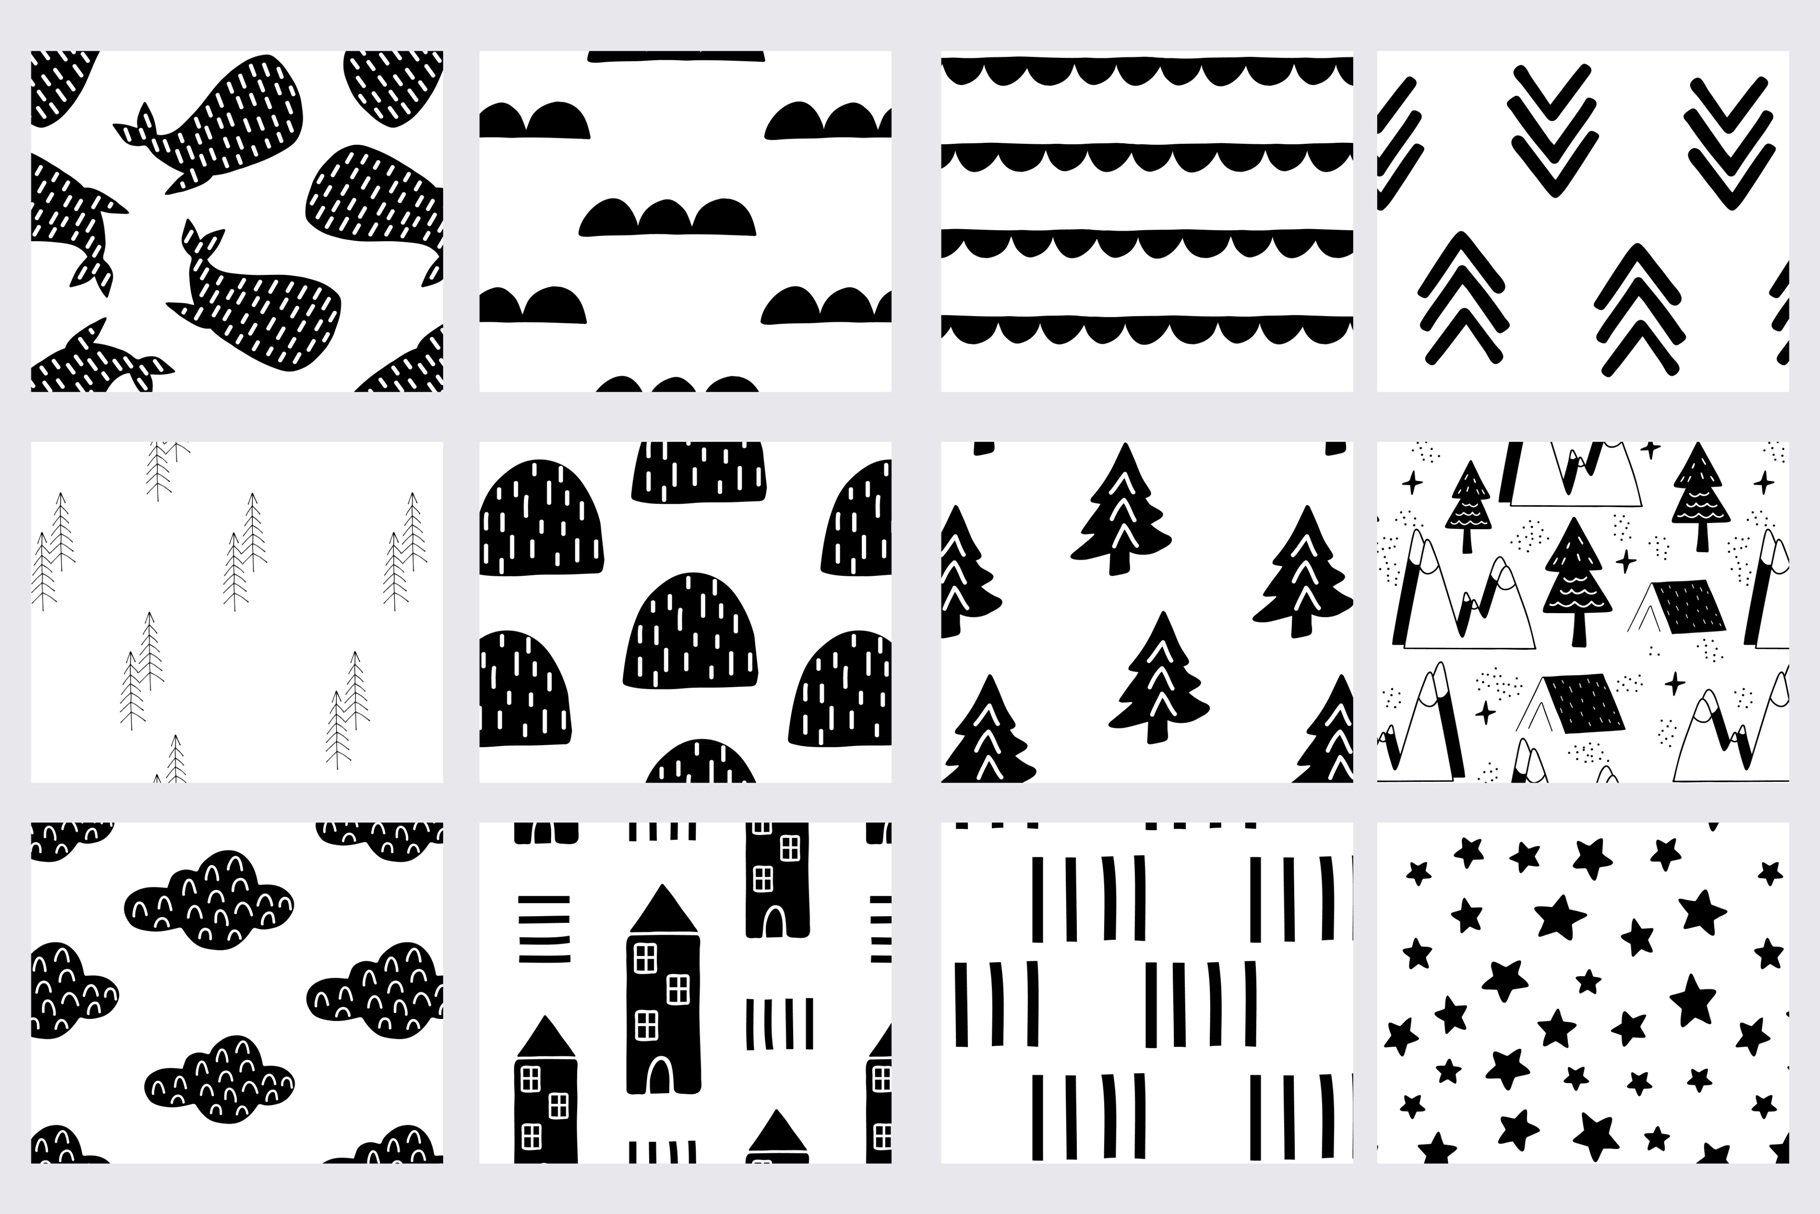 Patterns For Kids Scandi Style Scandi Style Kids Design Pattern